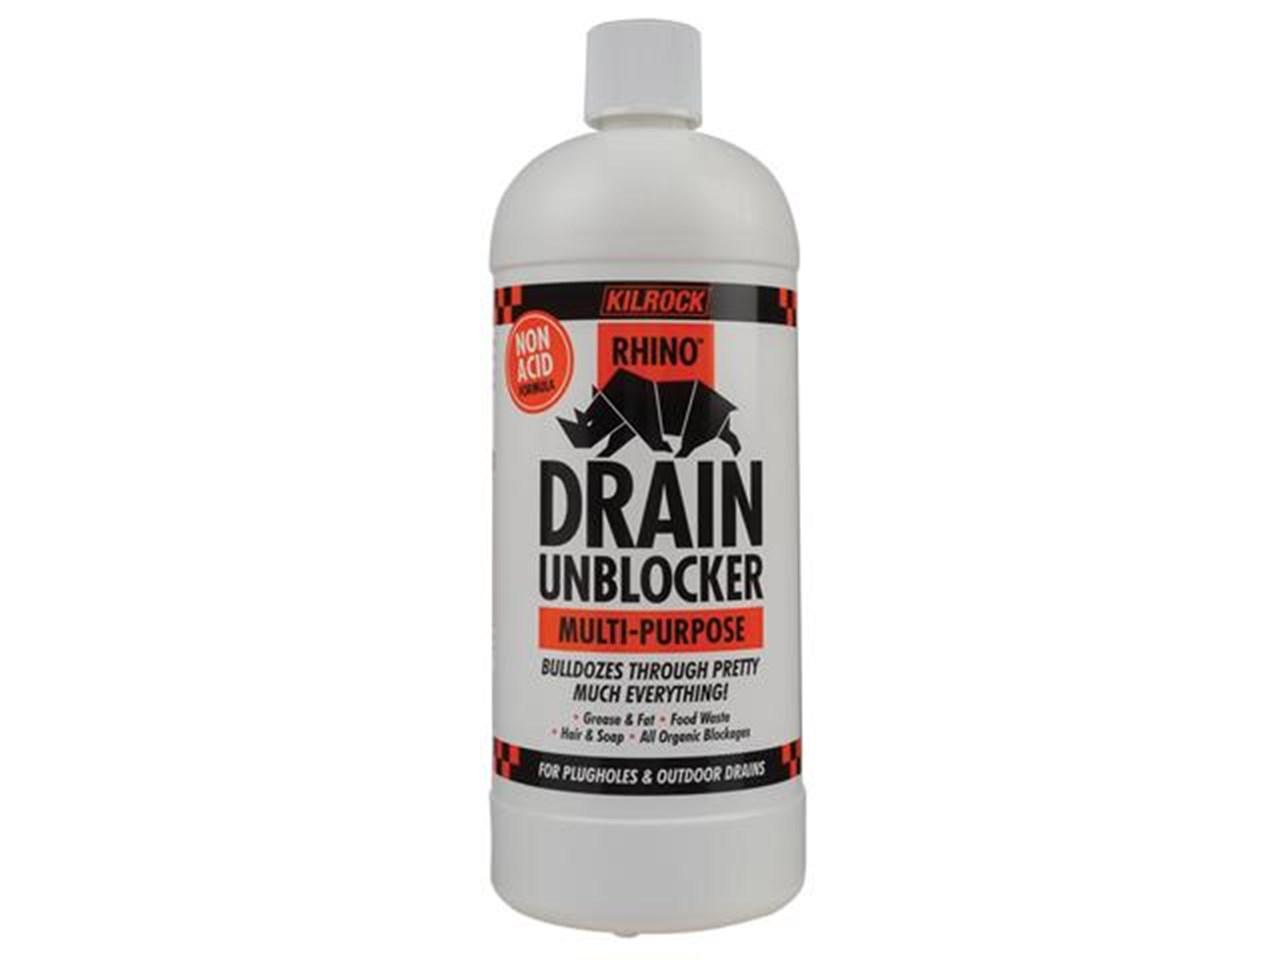 Rhino Multi-Purpose Drain Unblocker 1L – Now Only £7.00